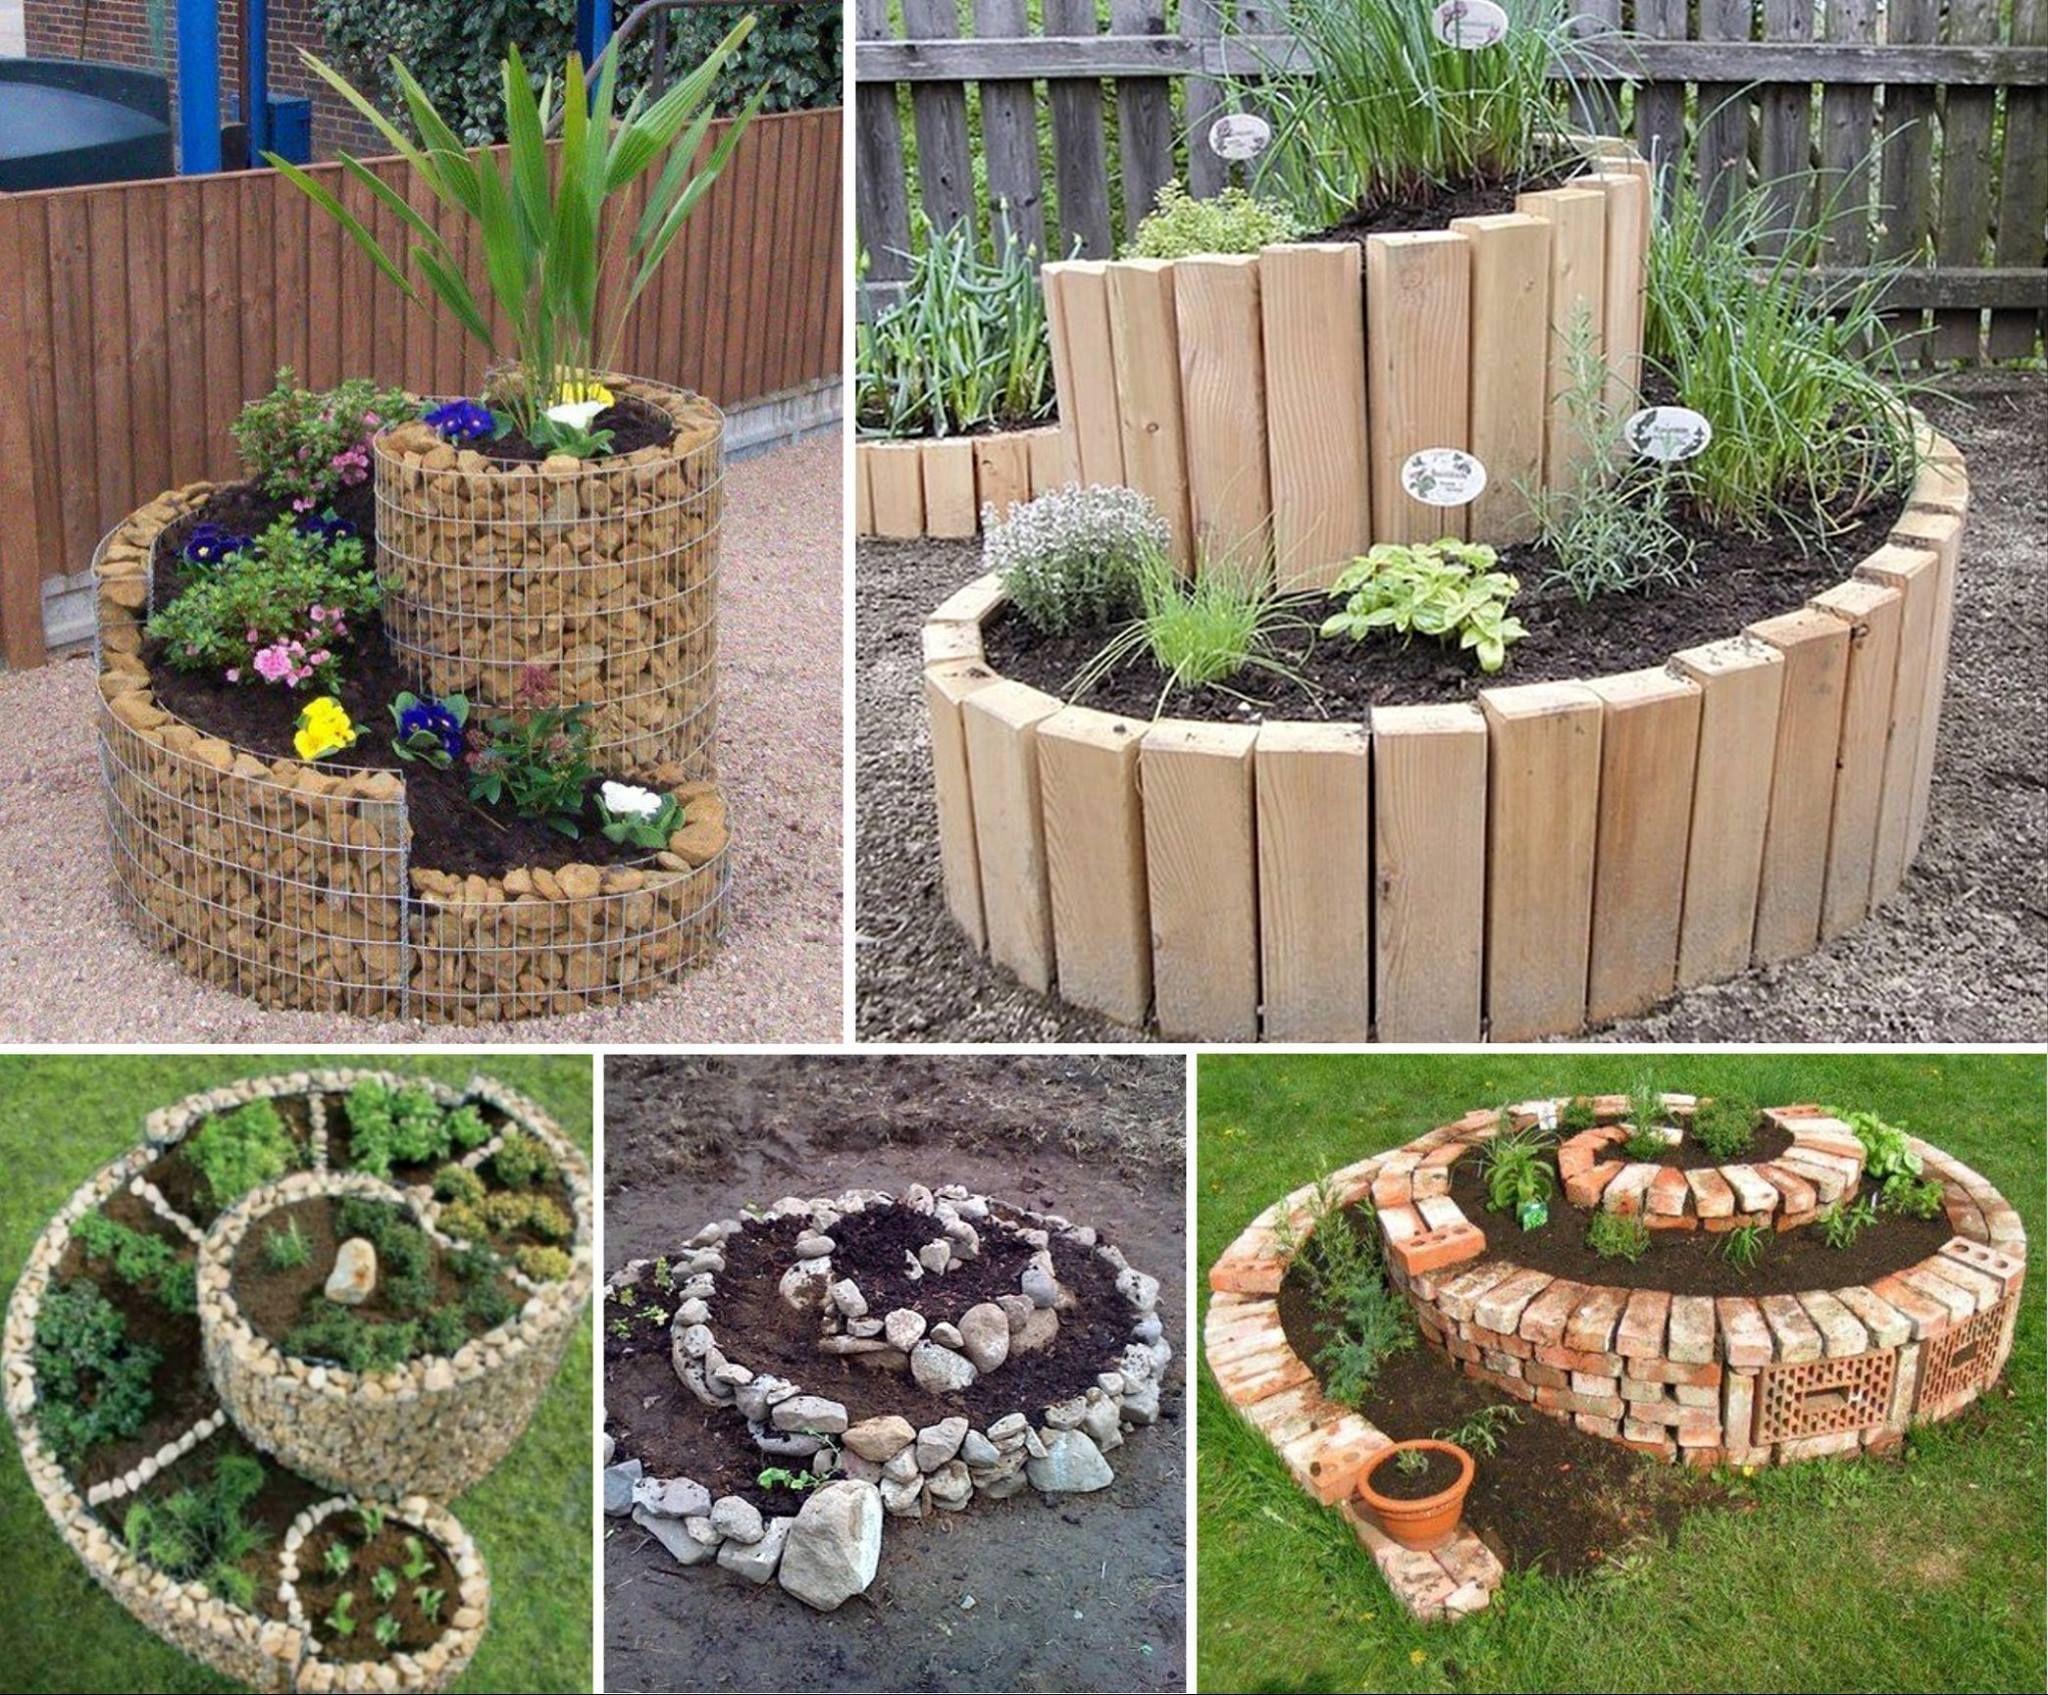 giardino spirale